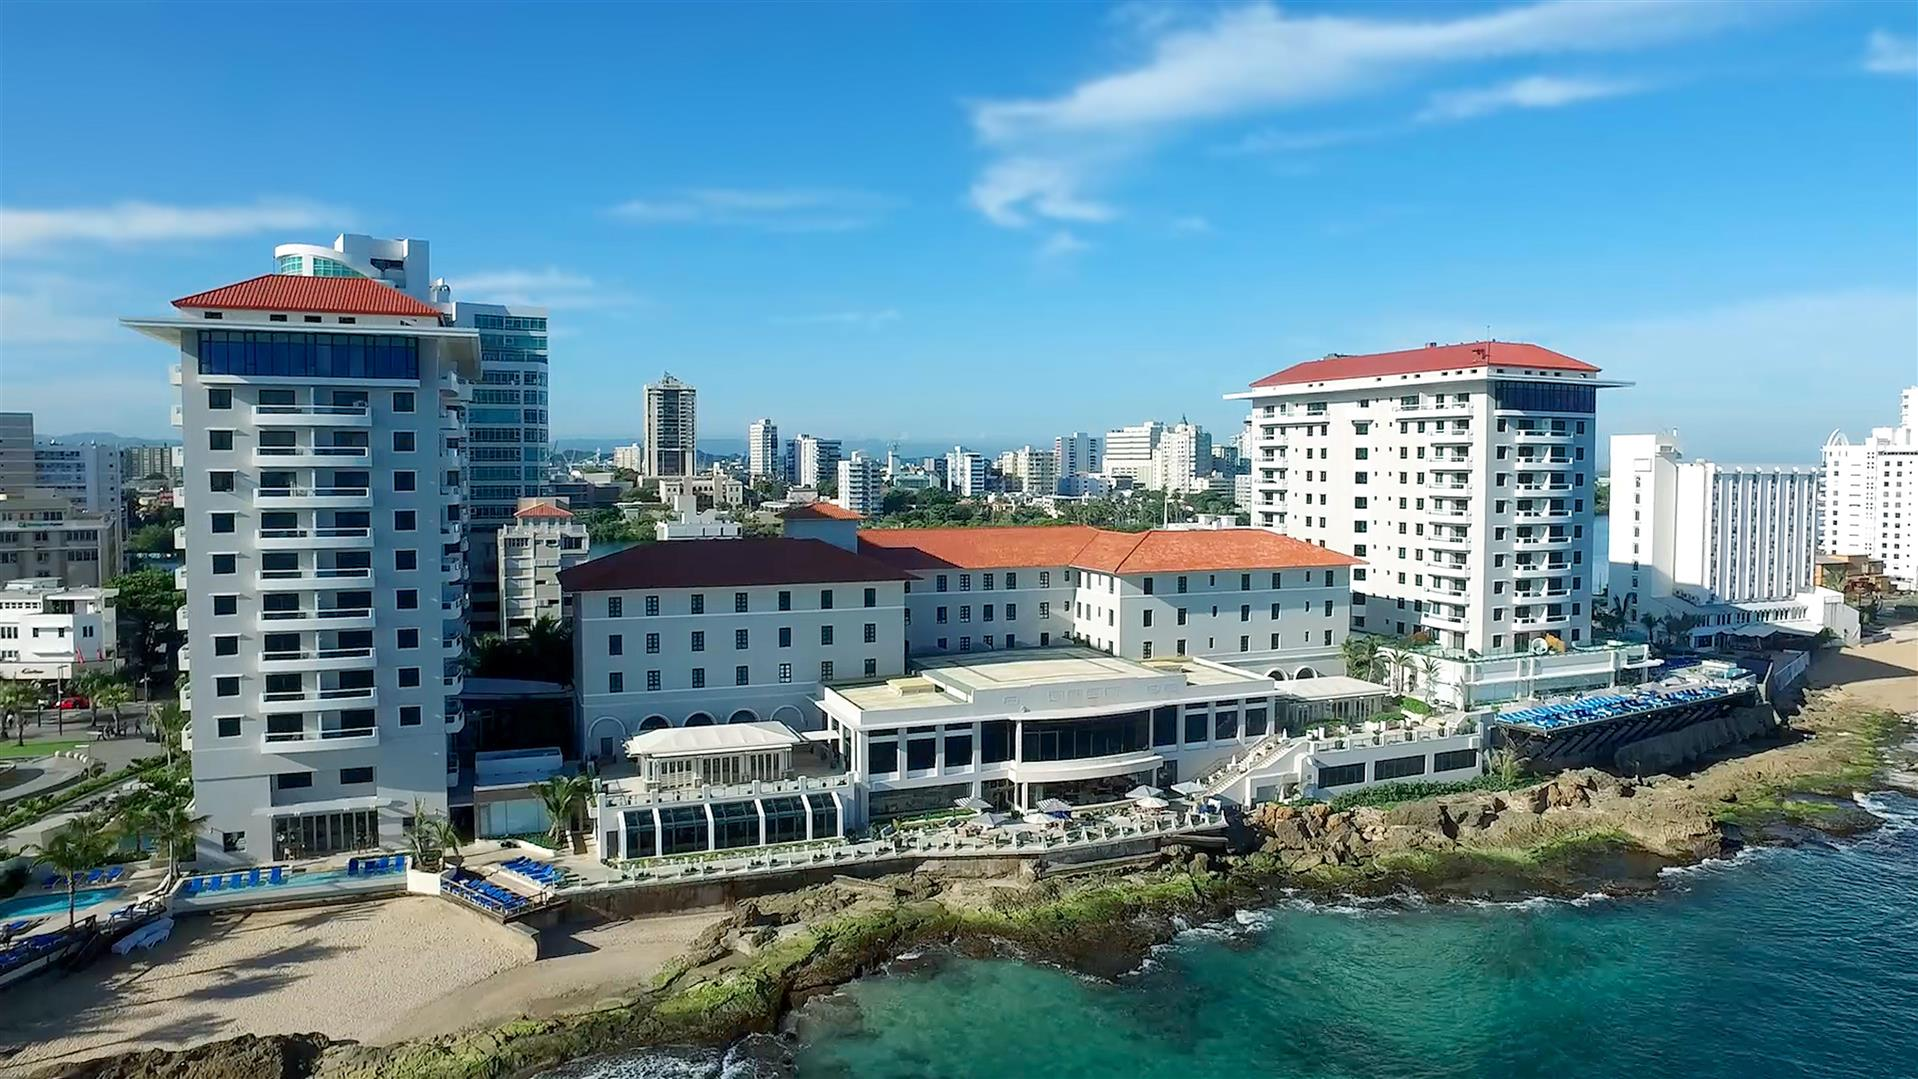 Meetings and events at Condado Vanderbilt Hotel, San Juan, PR